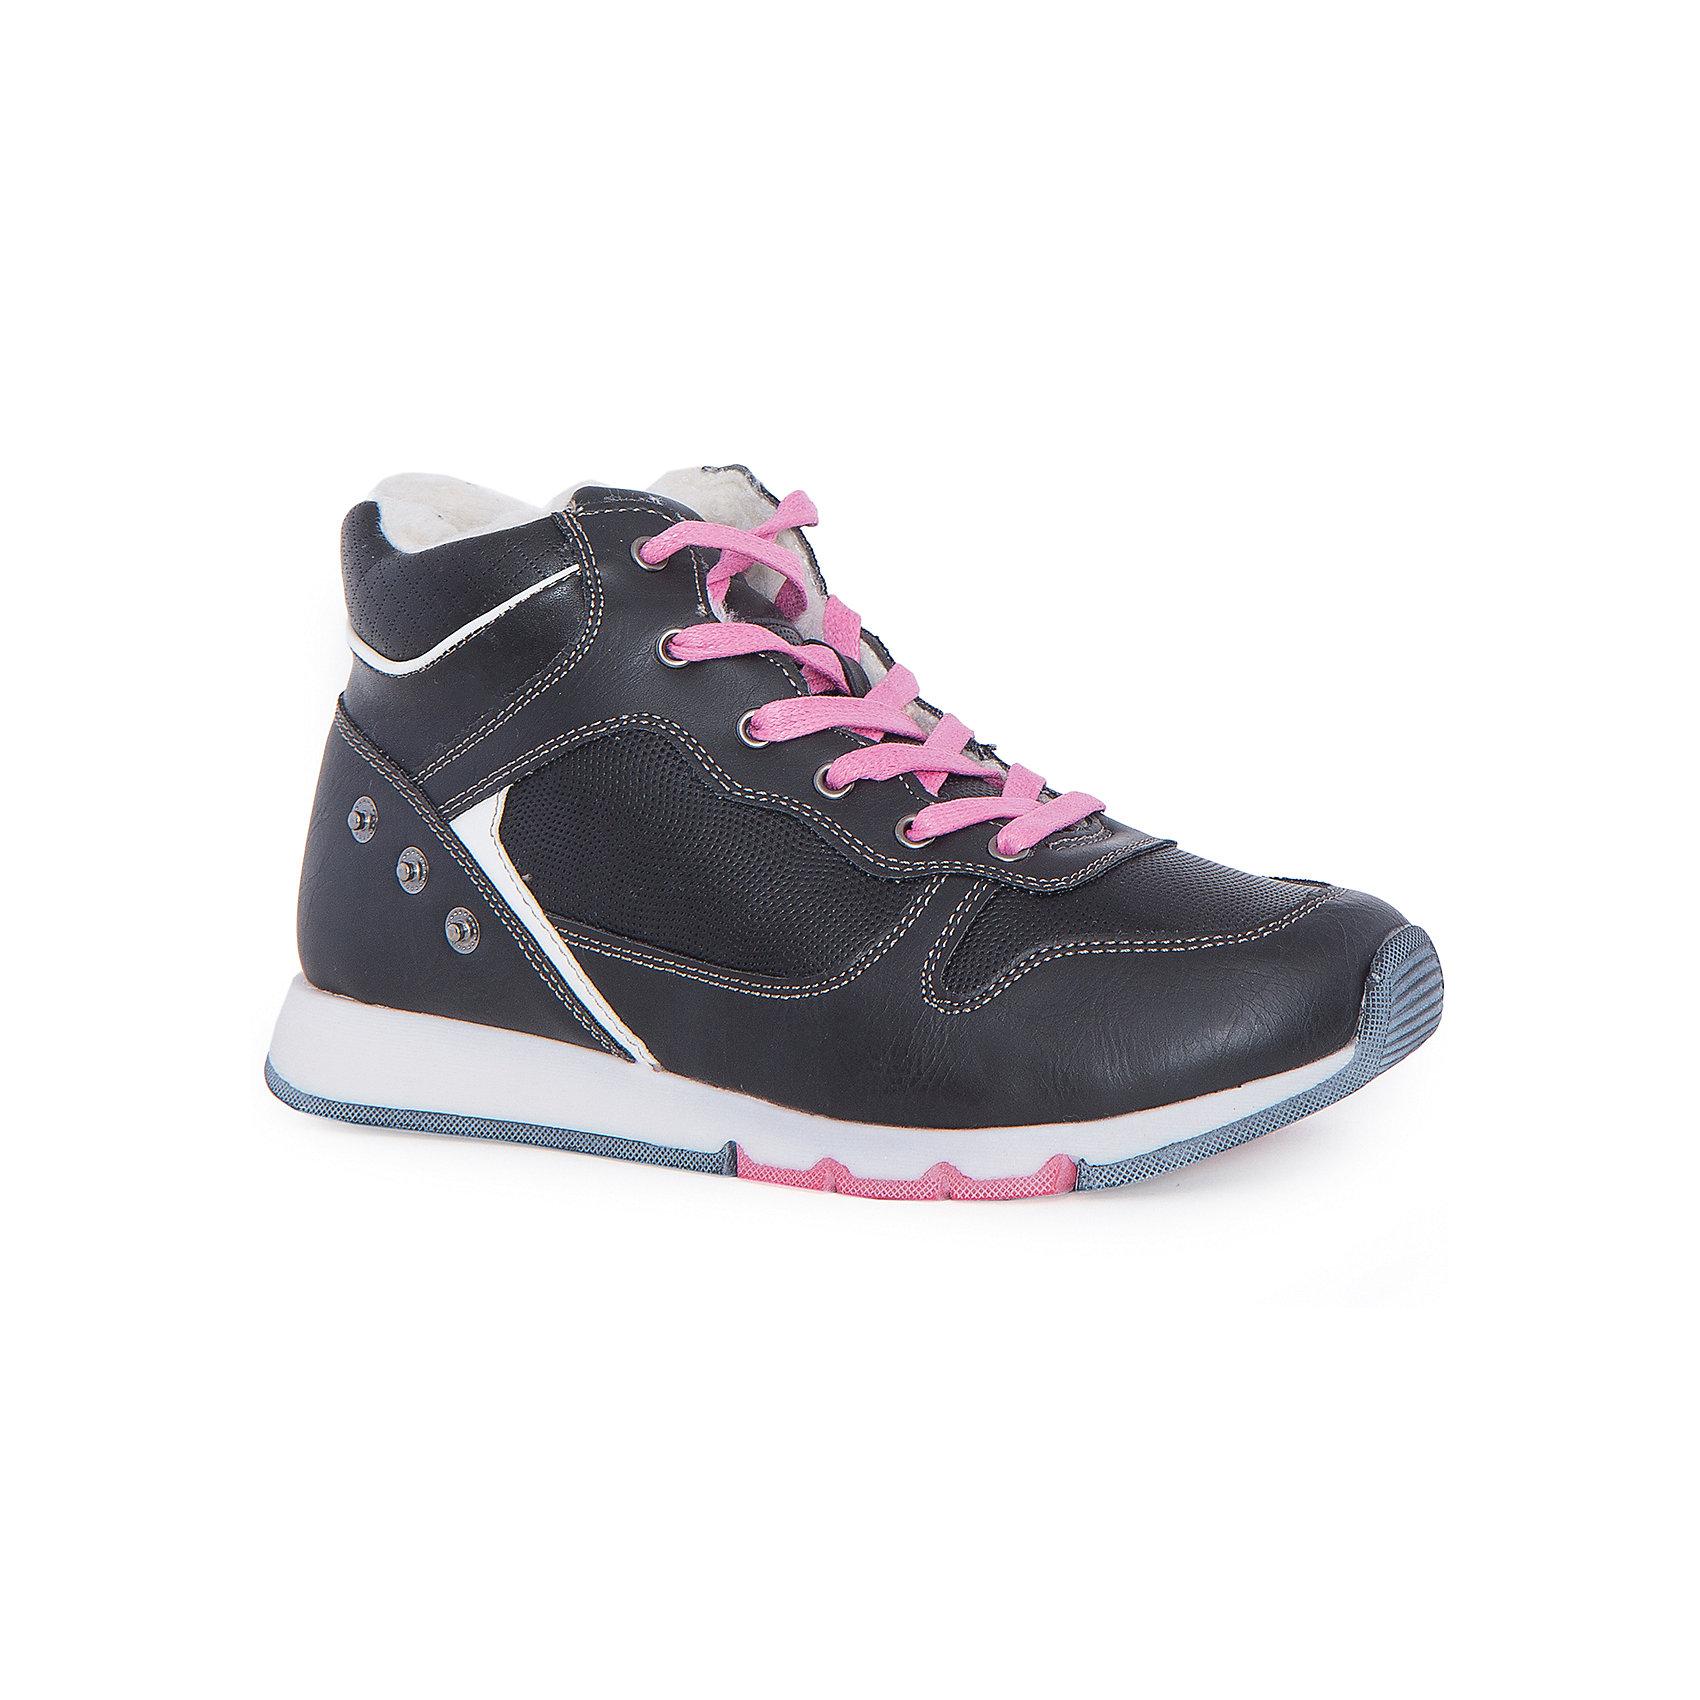 S'cool Ботинки для девочки S'cool